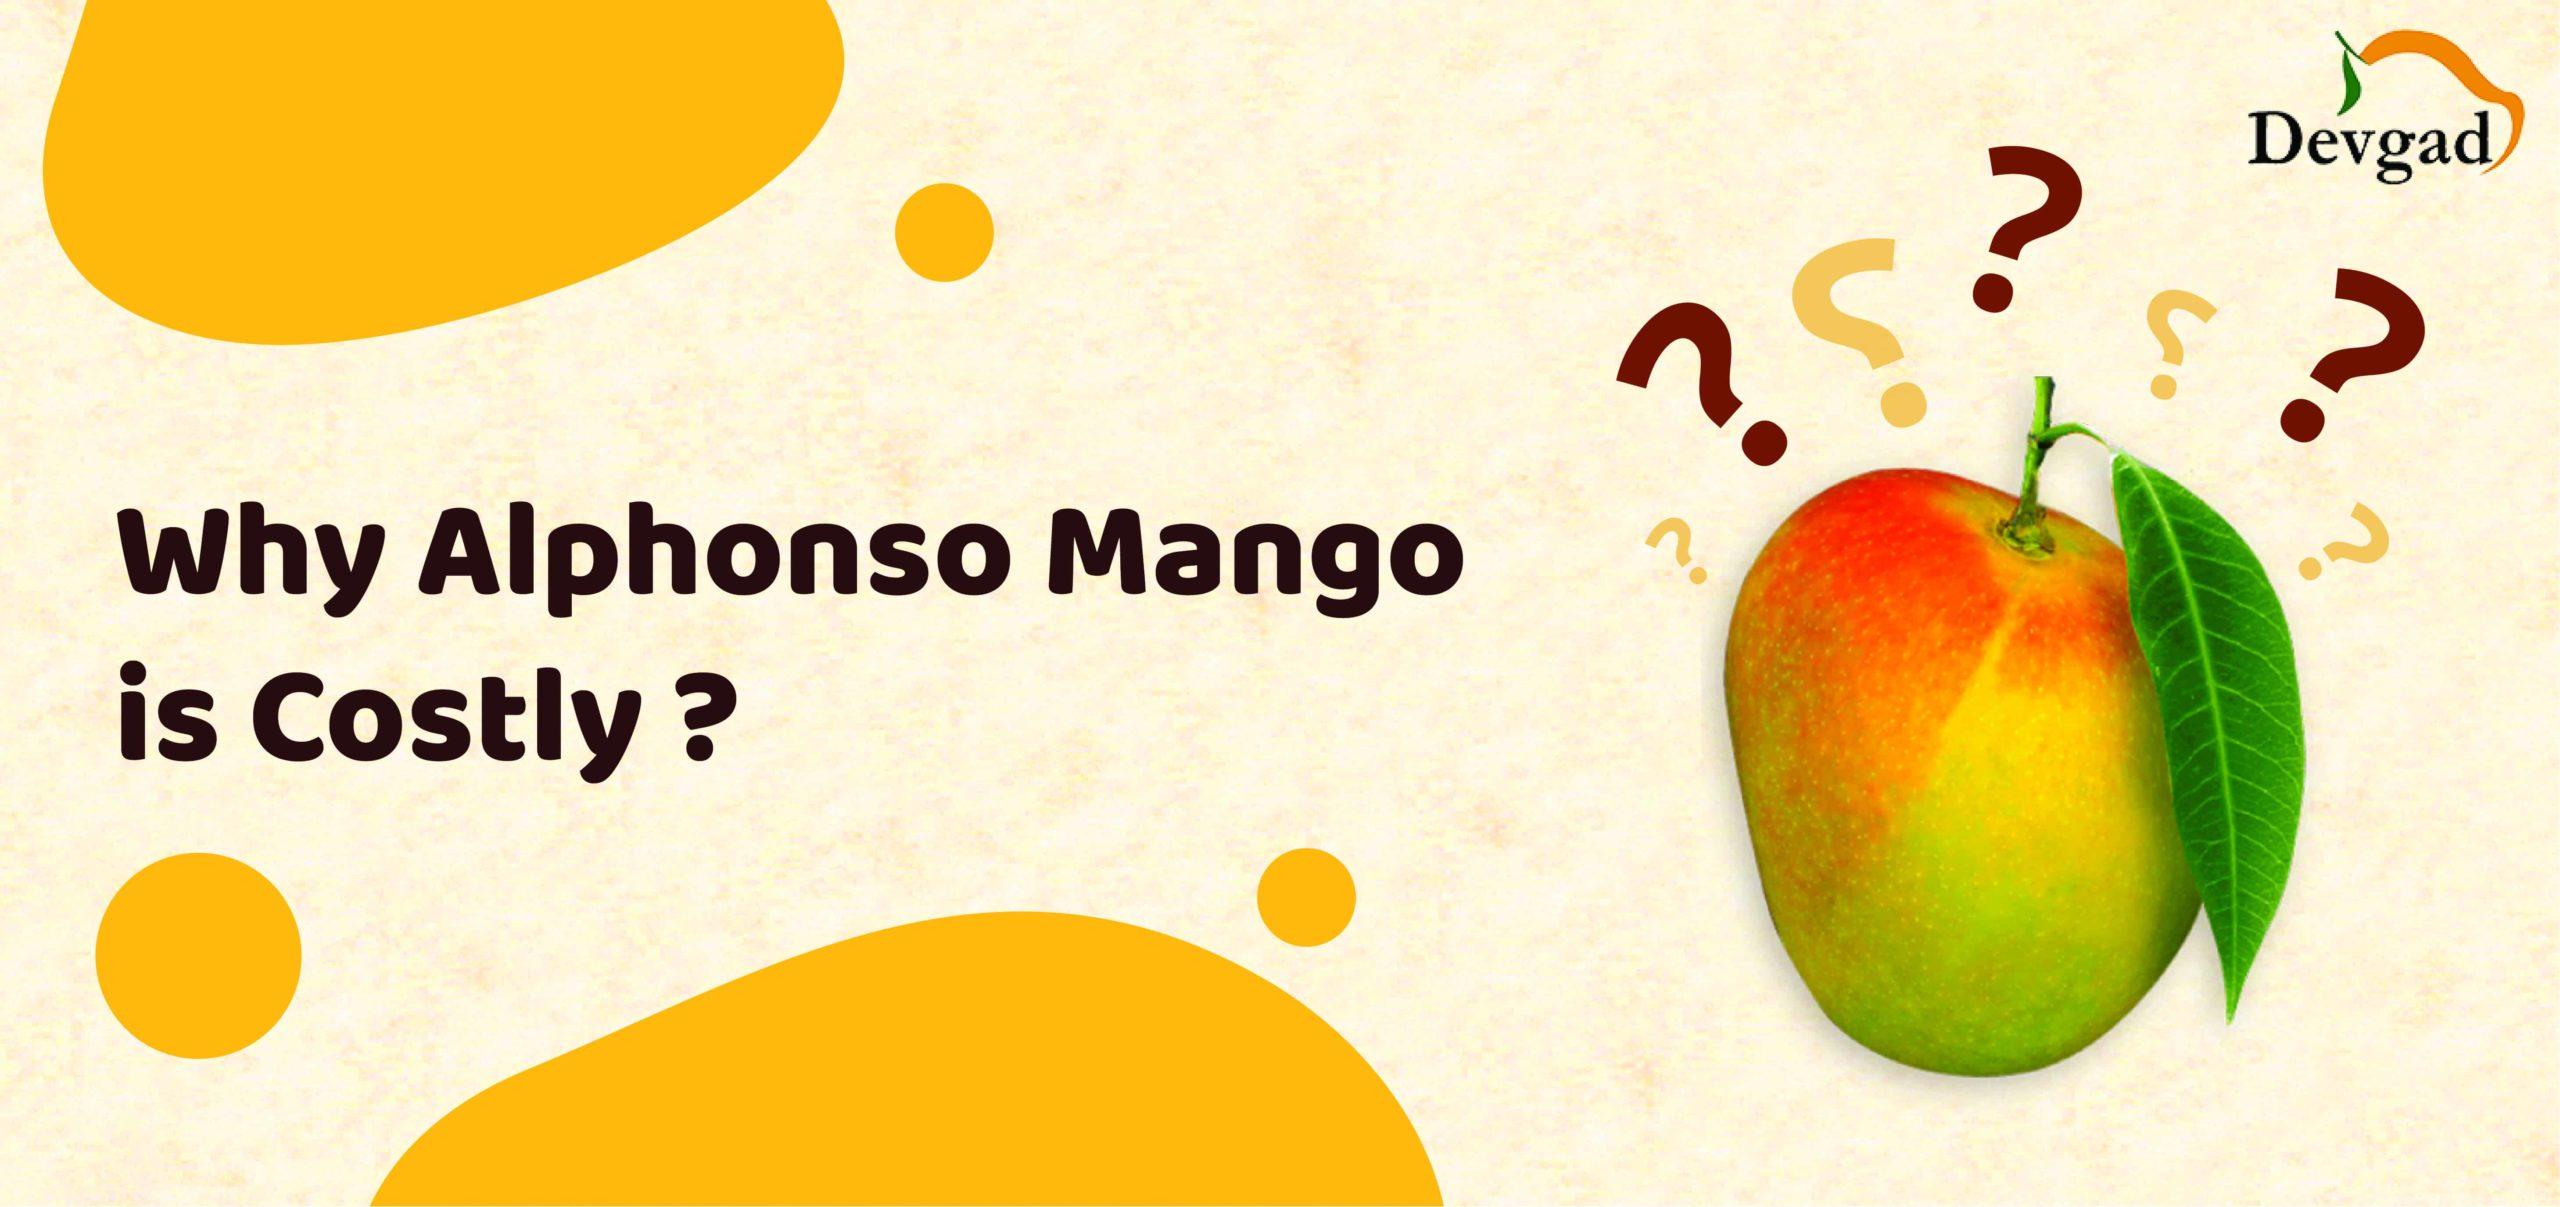 alphonso mango cost